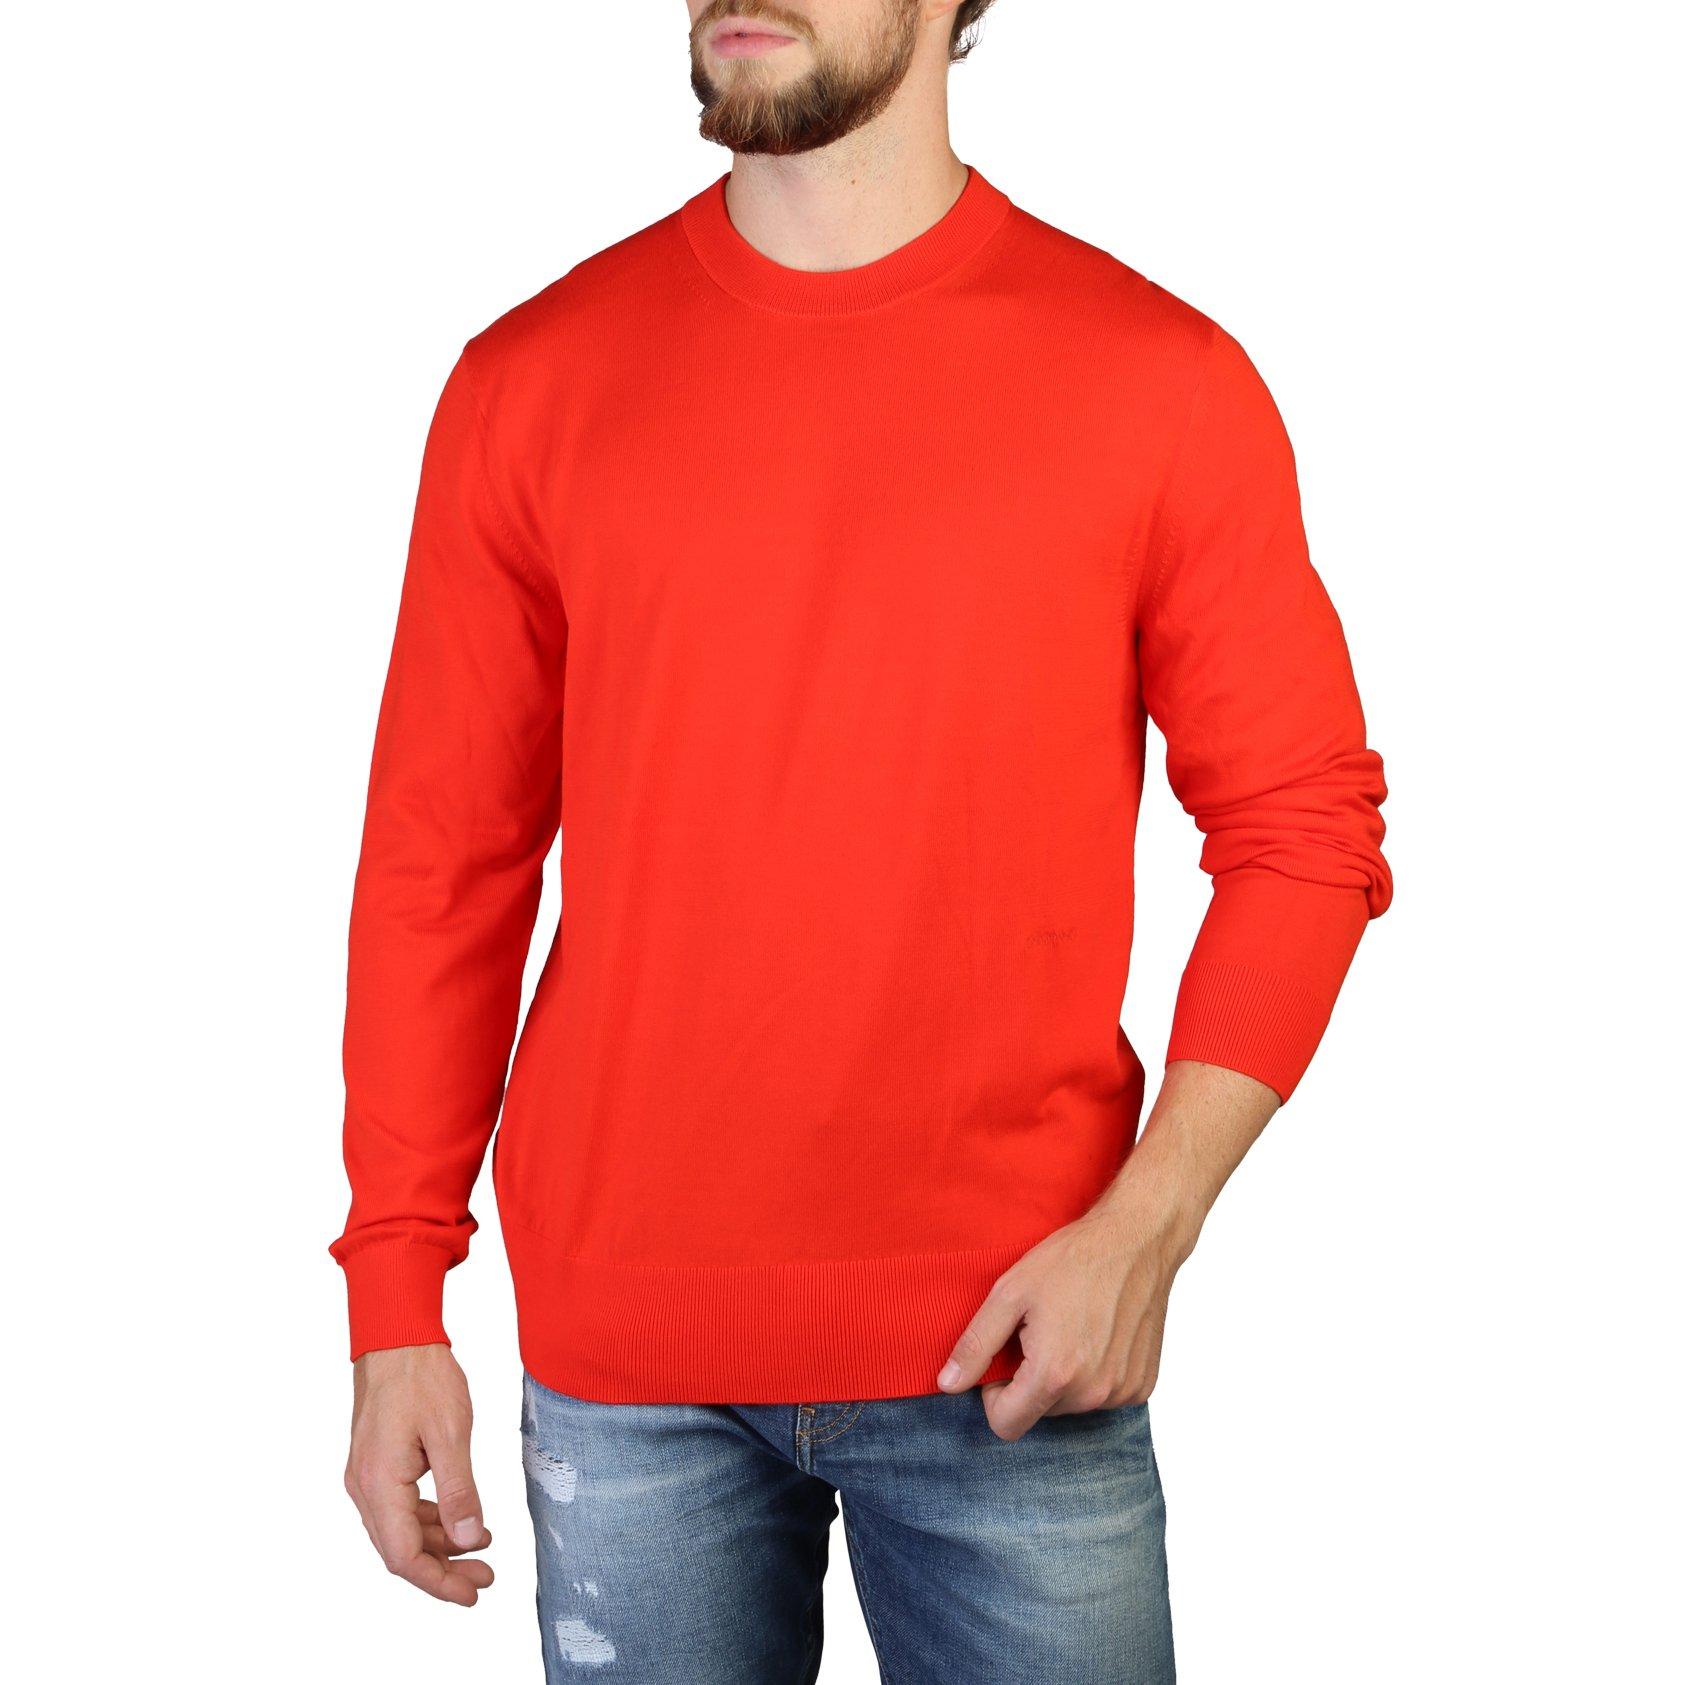 Calvin Klein Men's Sweaters Yellow 349373 - red S